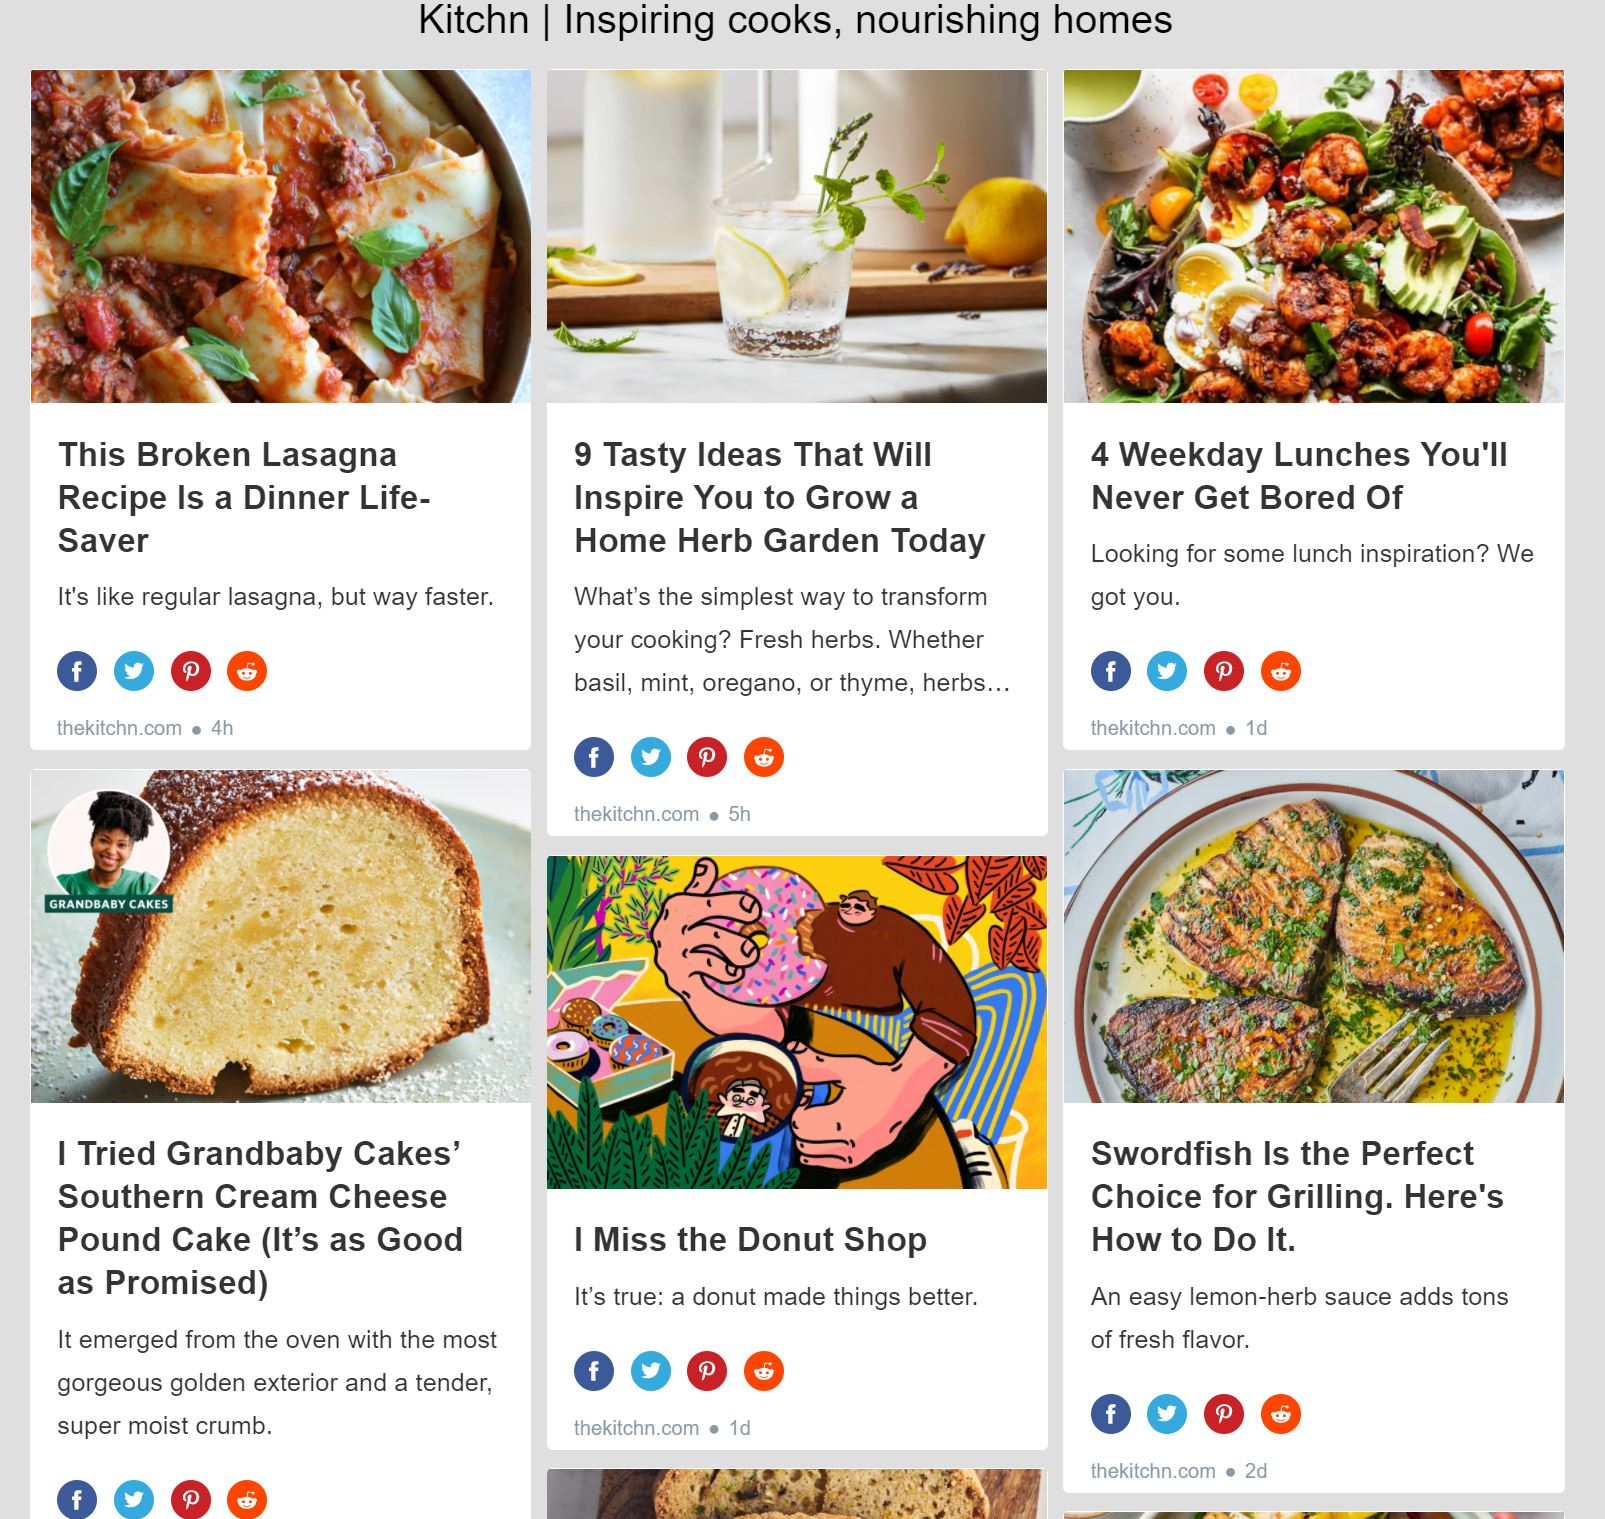 "<img src=""https://s3.amazonaws.com/images.rss.app/food%20feed.JPG"">"